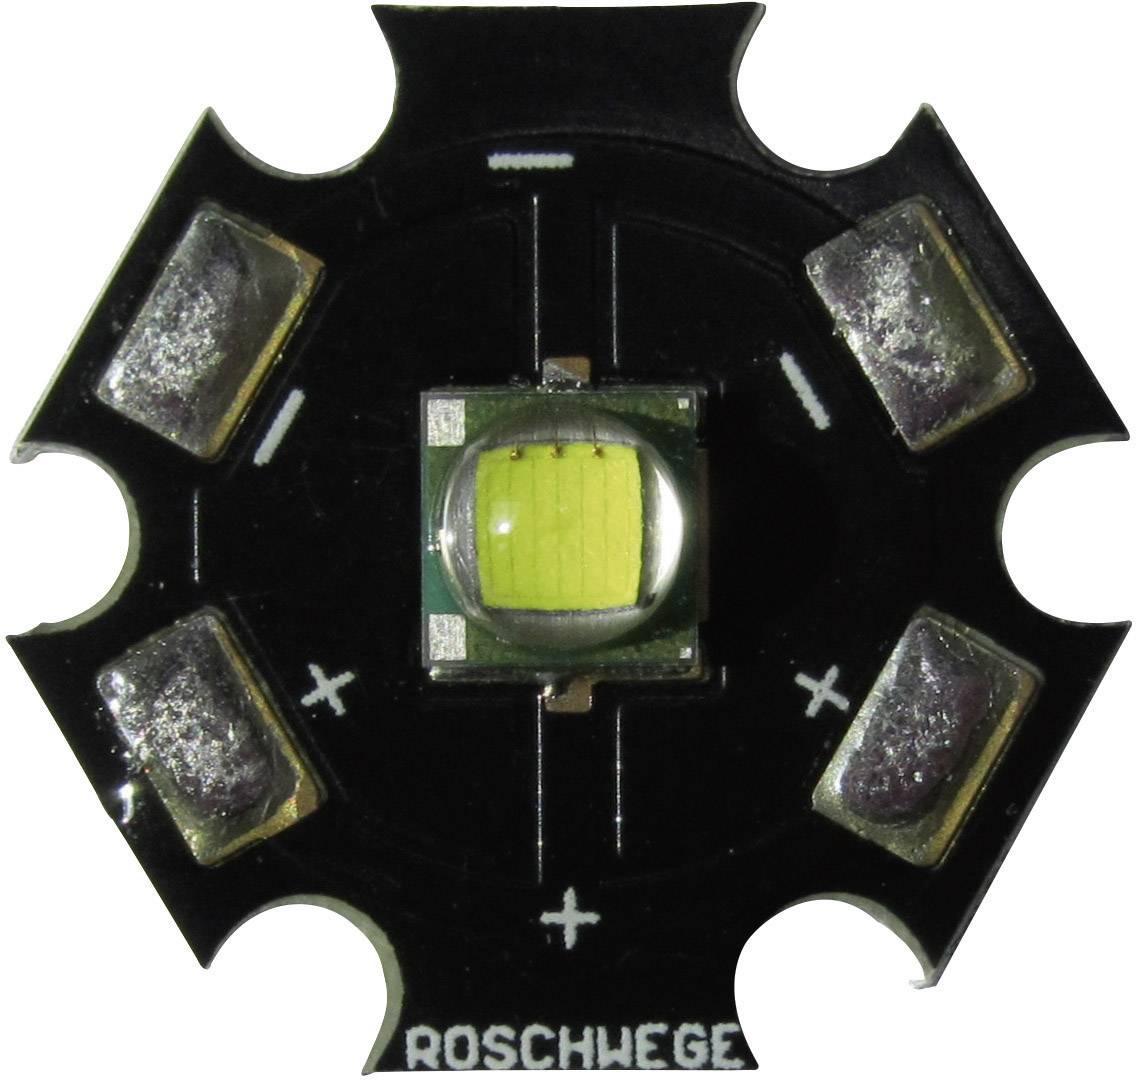 HighPower LED Roschwege 10 W, 260 lm, 3.1 V, 1500 mA, neutrálne biela